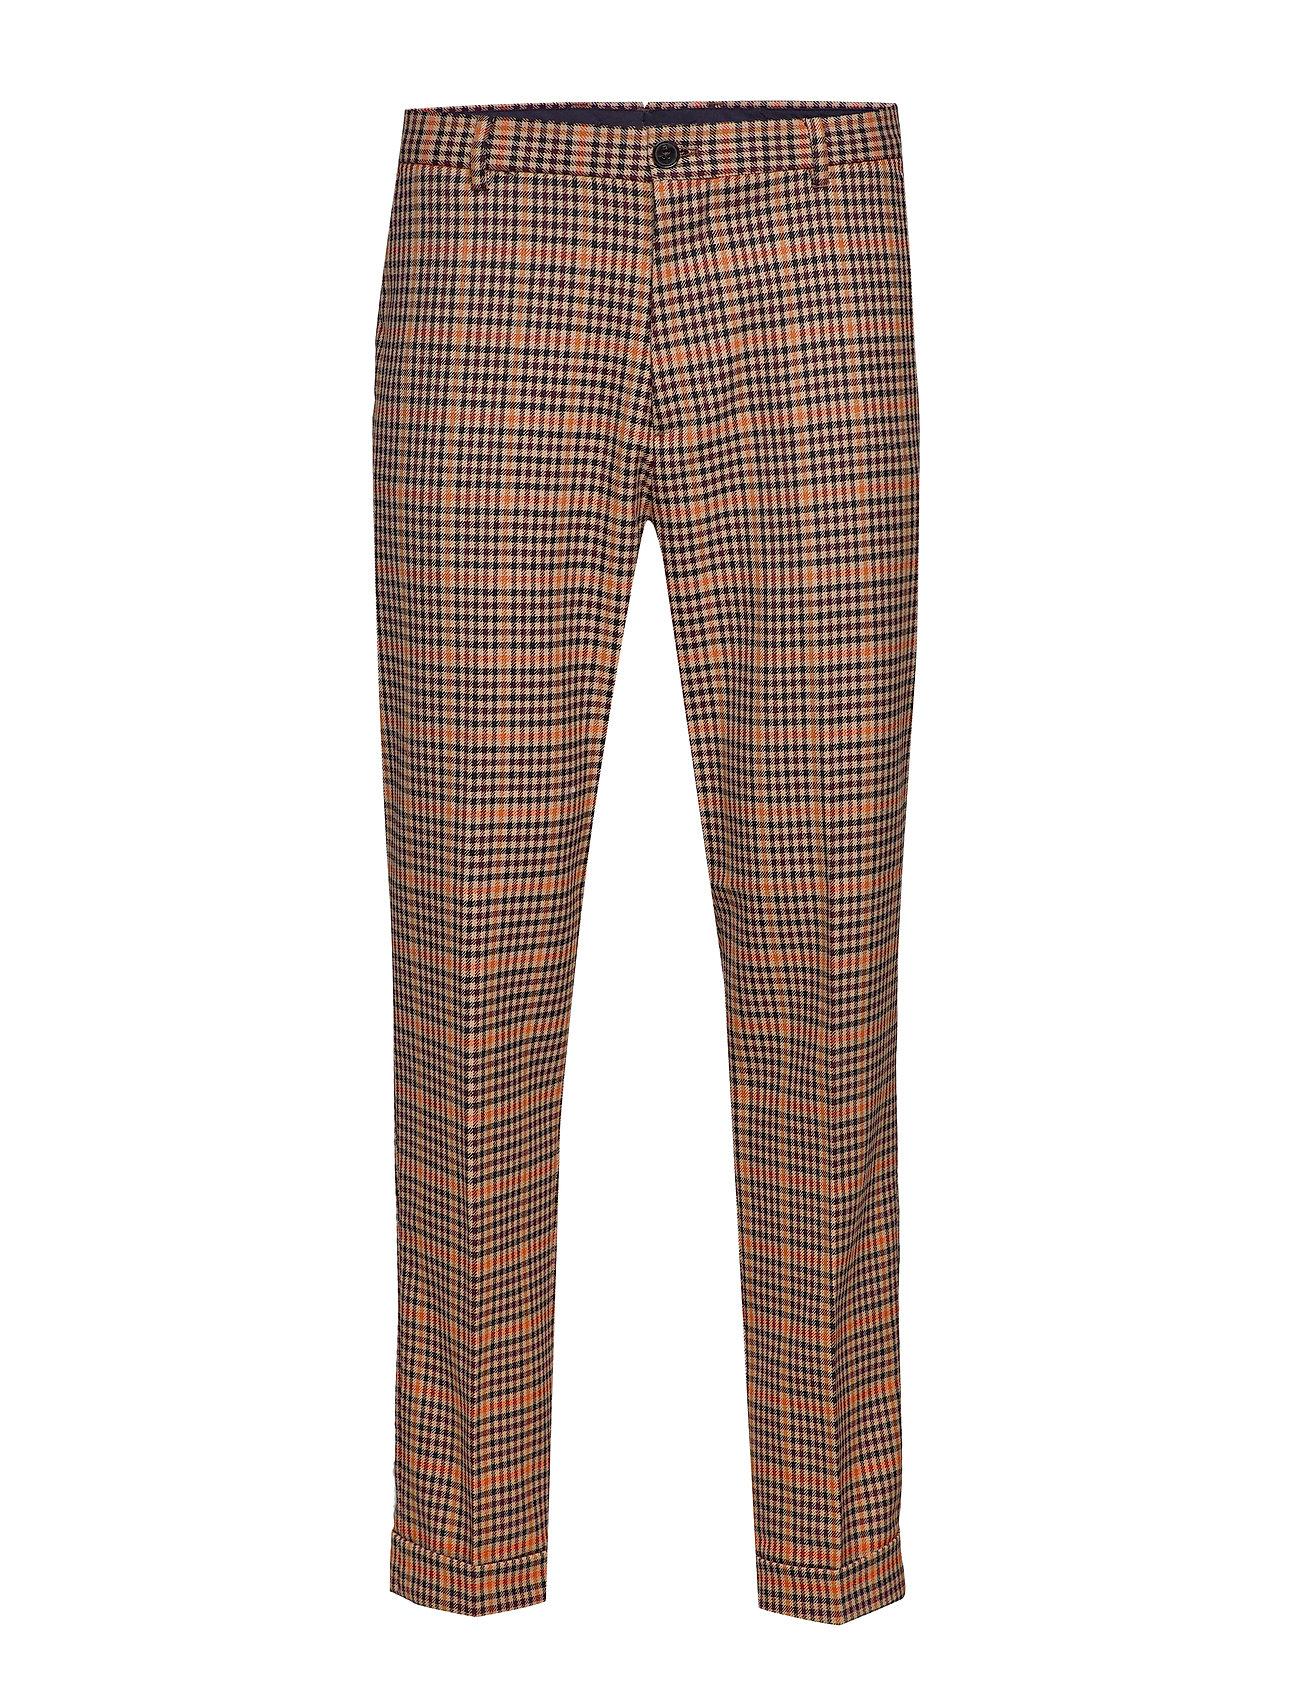 Scotch & Soda SEASONAL FIT- Chic gentlemans chino in yarn-dyed pattern - COMBO B